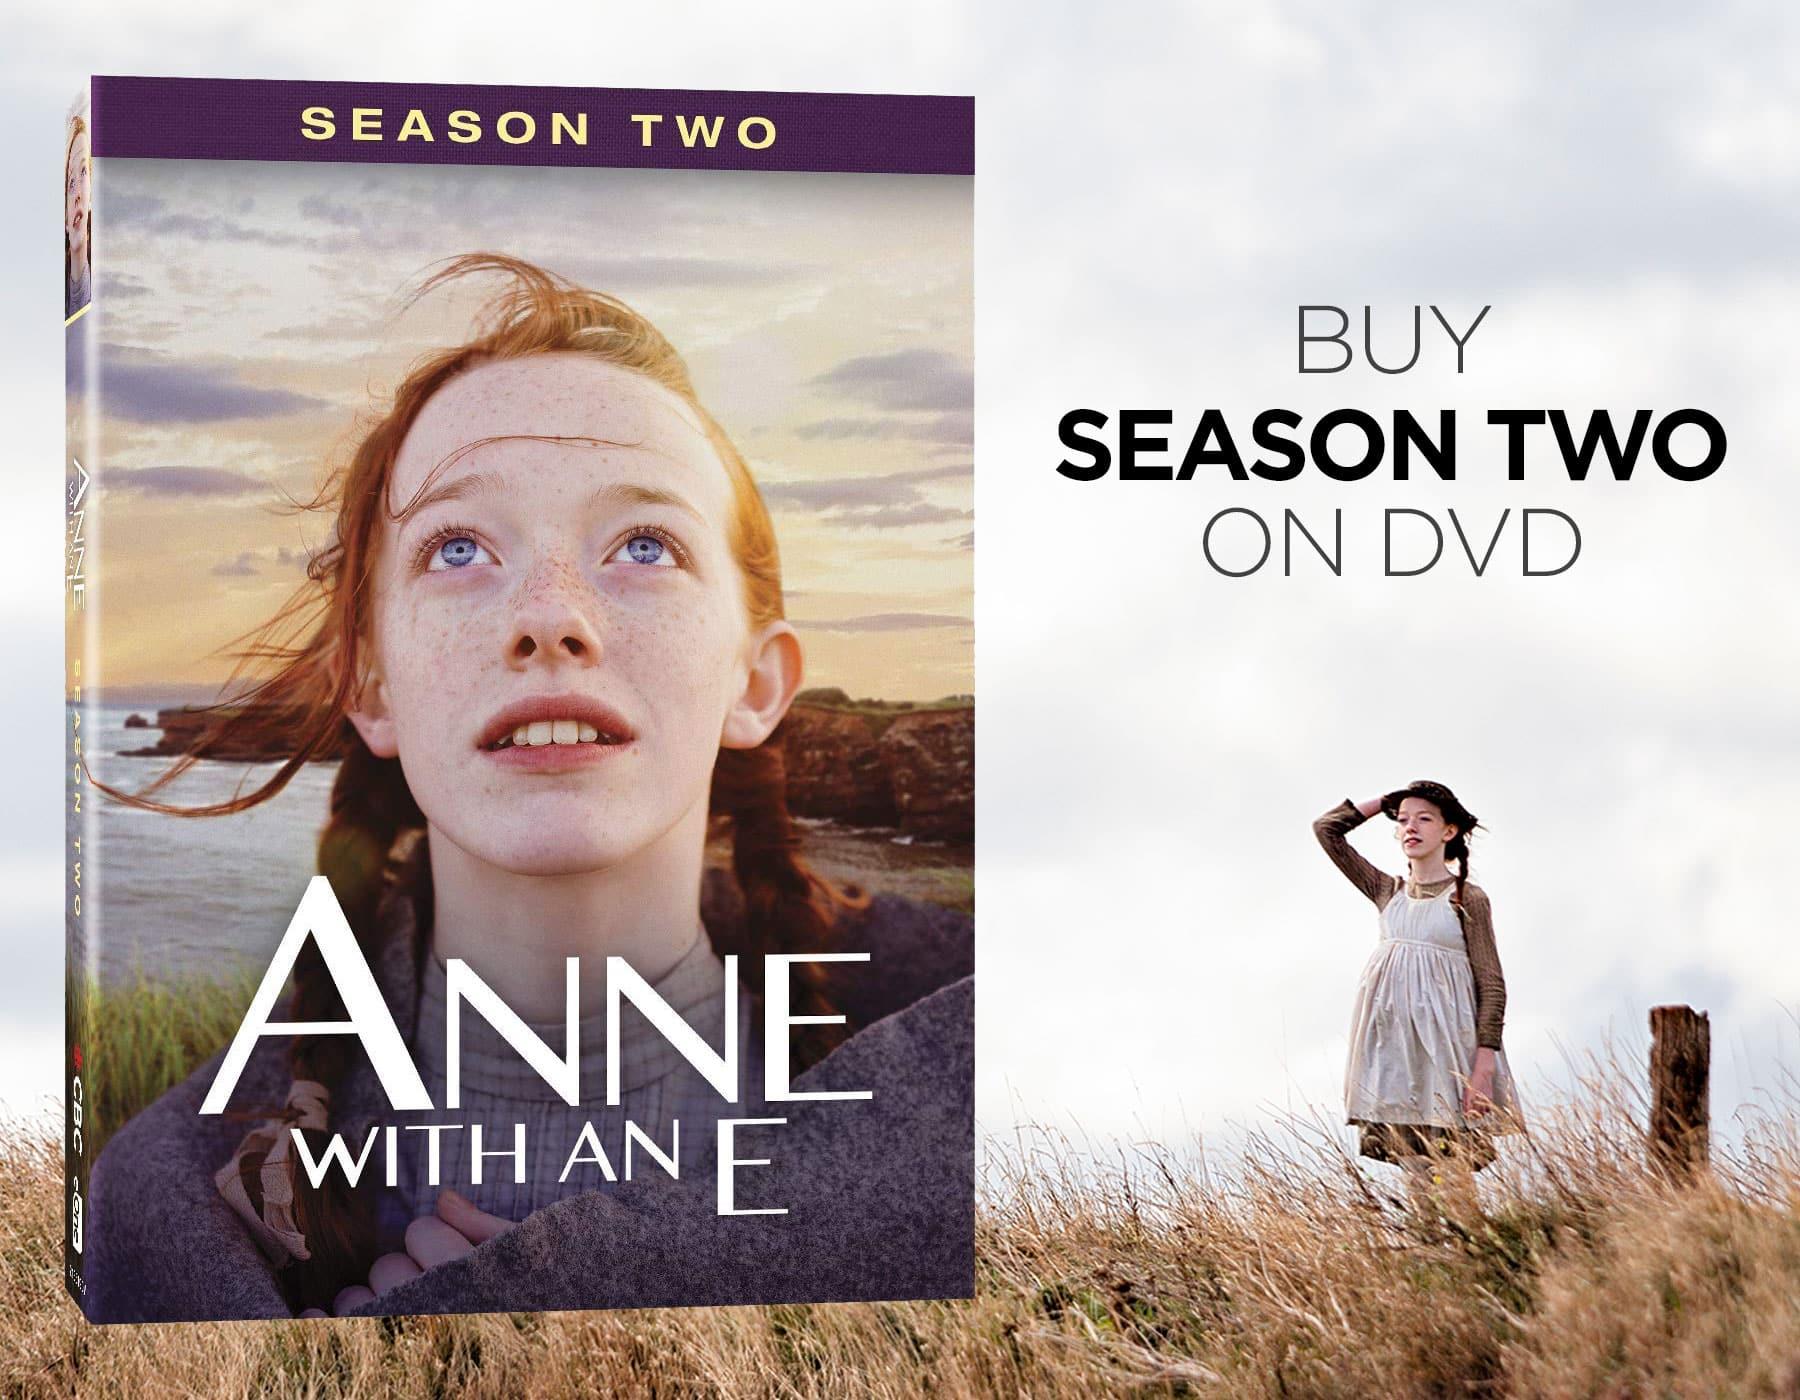 Buy Season 2 on DVD